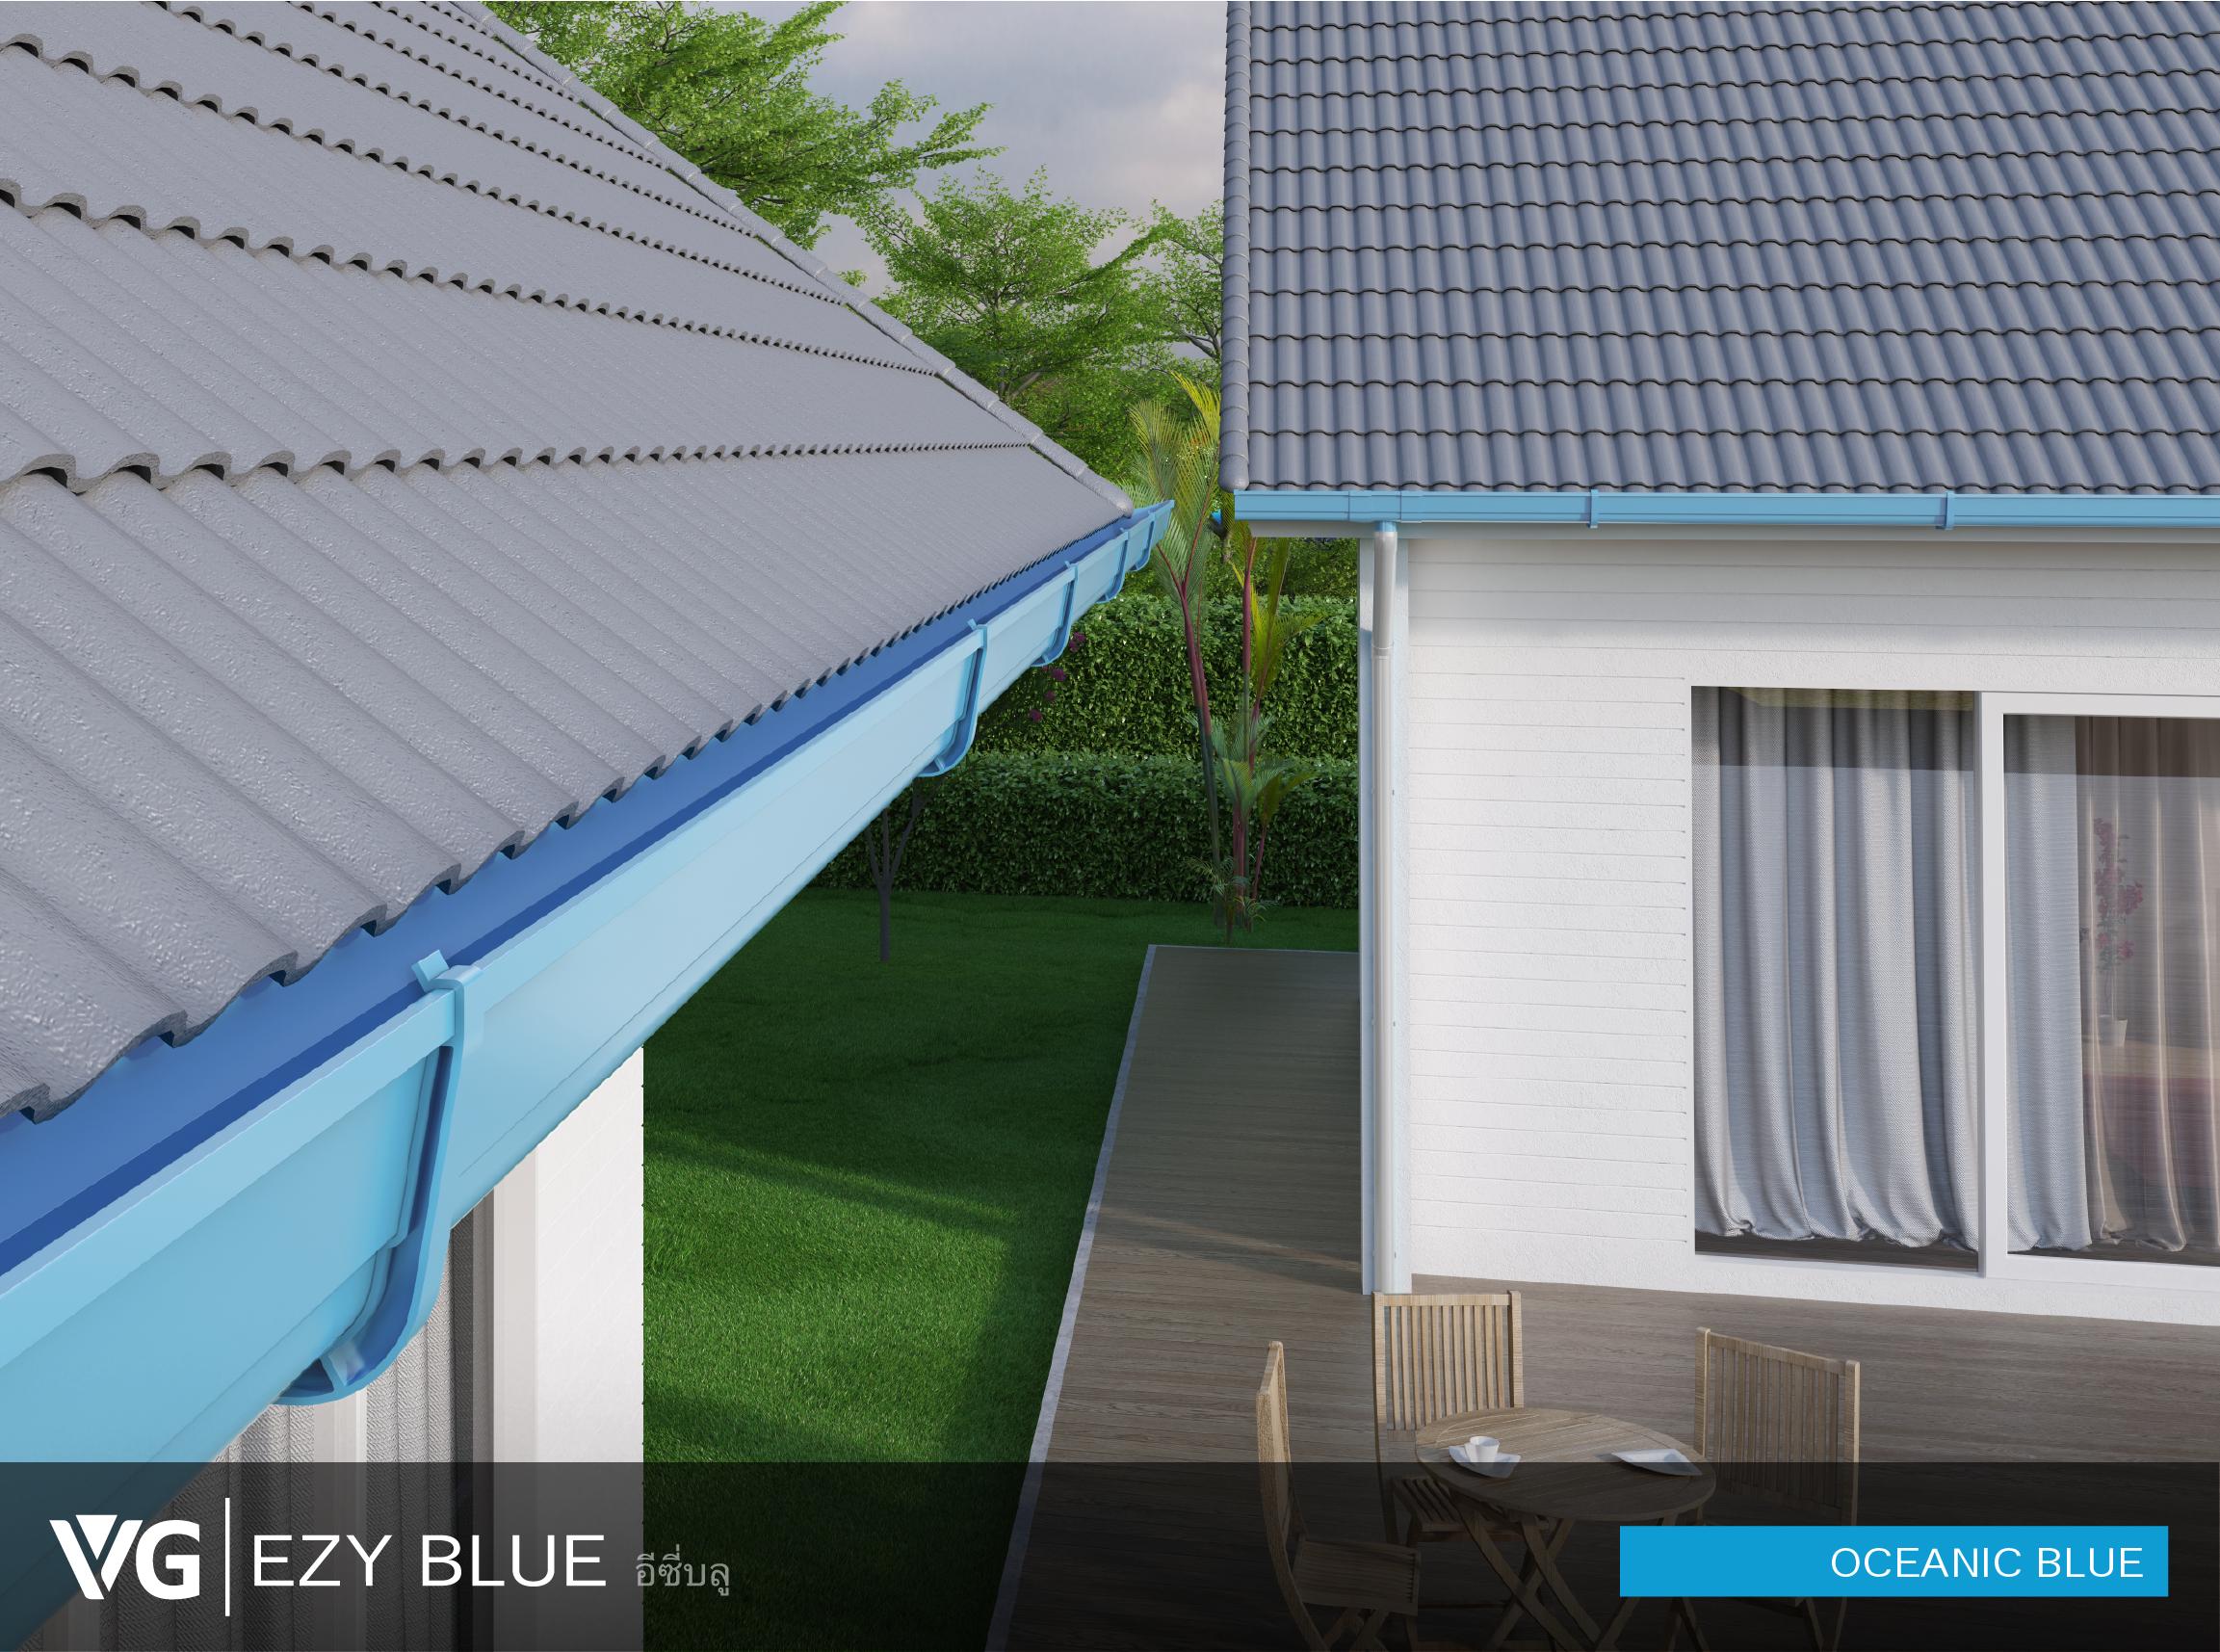 VG l Ezy Blue